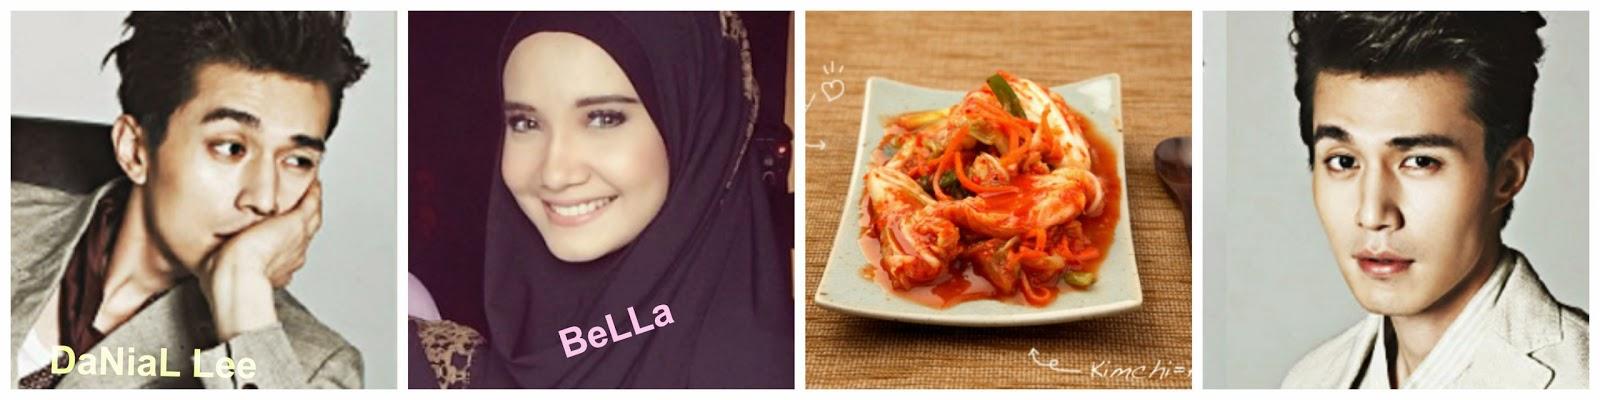 Kimchi Untuk Awak Episode 2 Full — brad erva-doce info